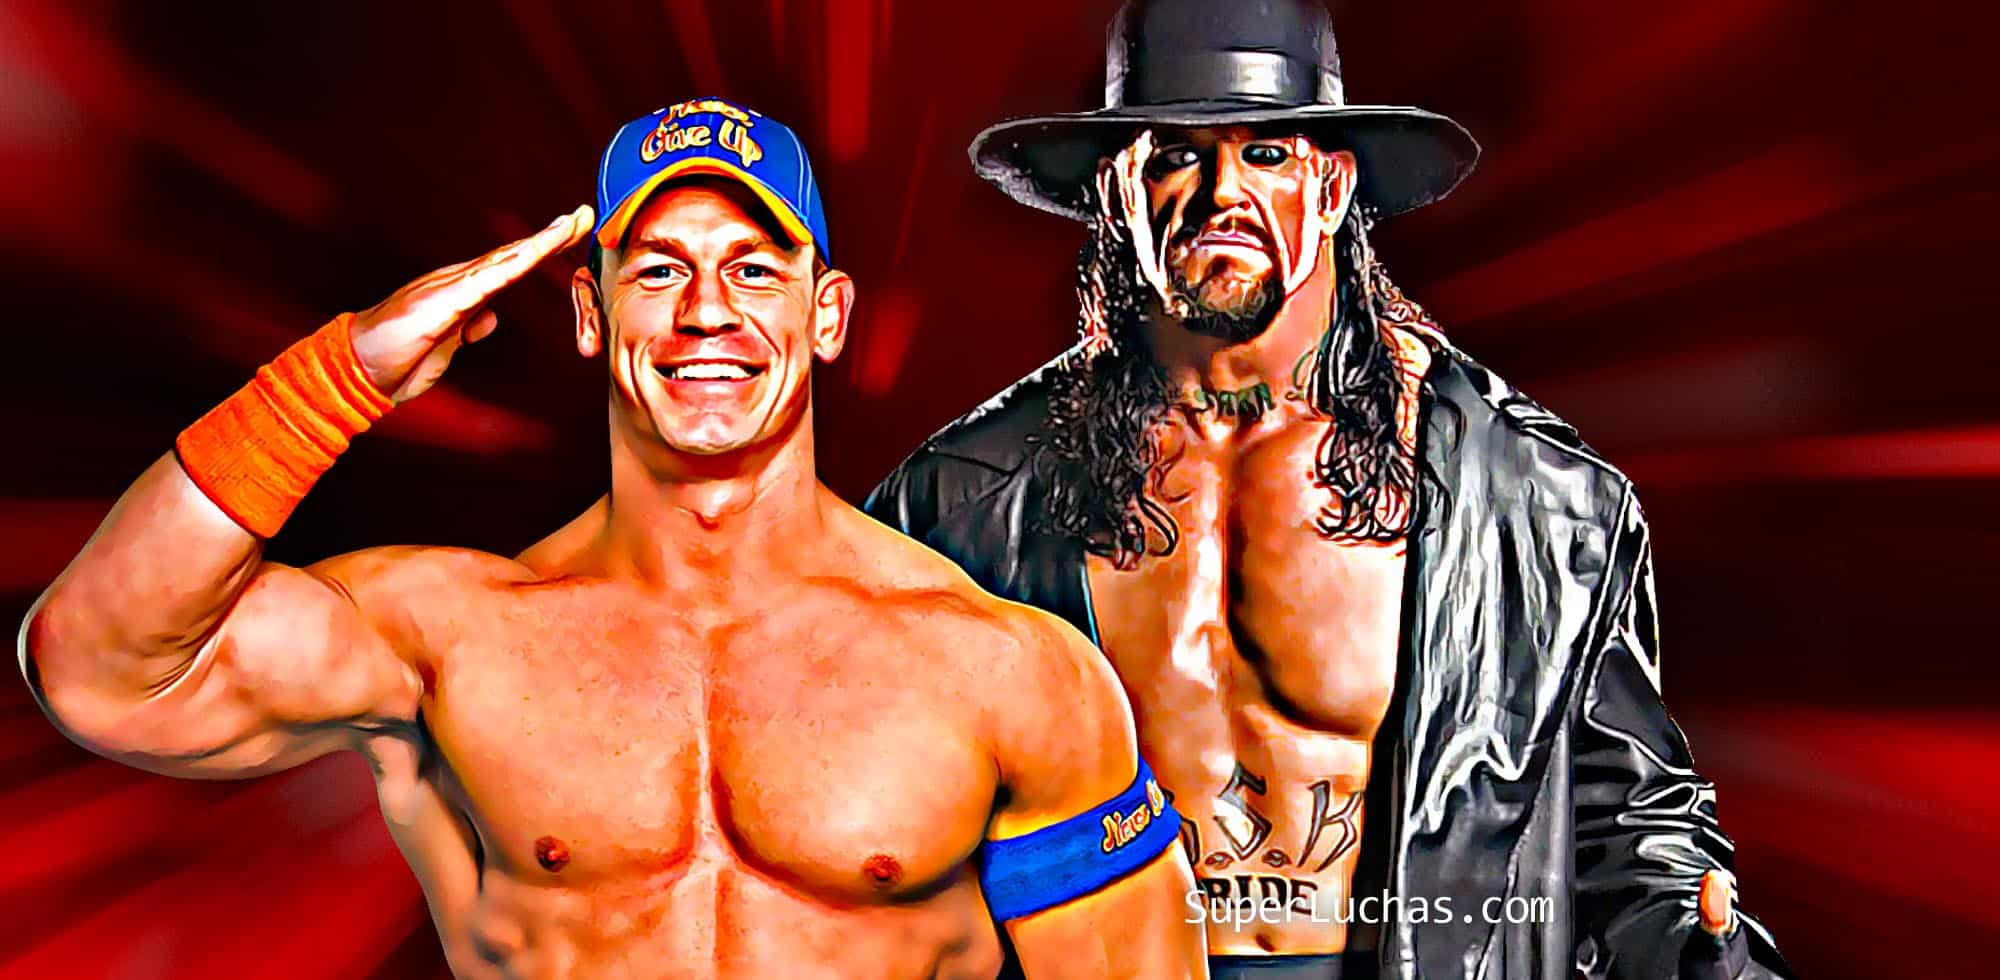 John Cena Undertaker